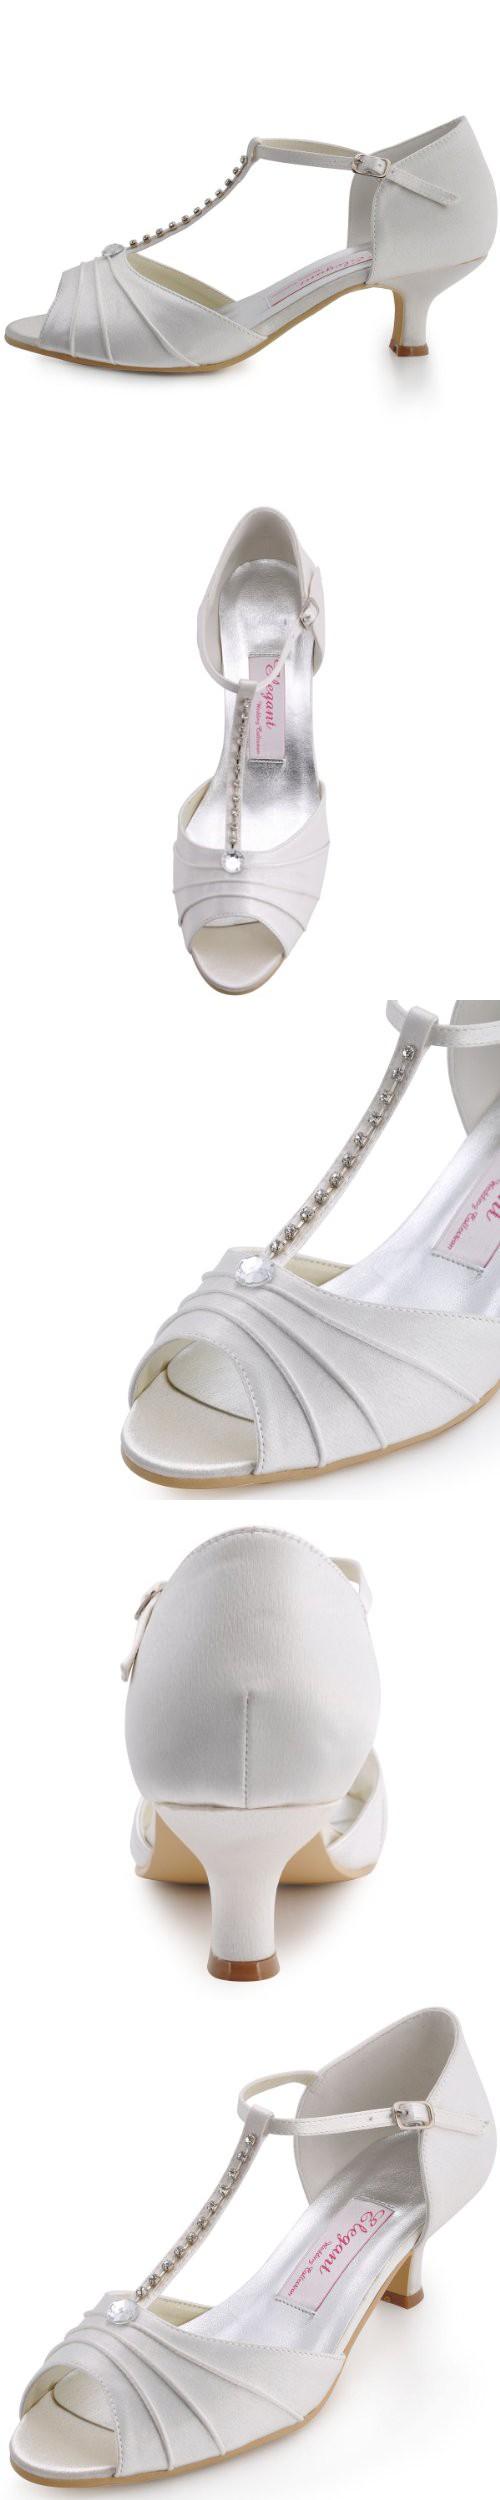 c02bd319c51aa0 ElegantPark EL-035 Women Peep Toe T-Strap Pumps Mid Heel Rhinestones Satin  Evening Wedding Dress Shoes Ivory US 10